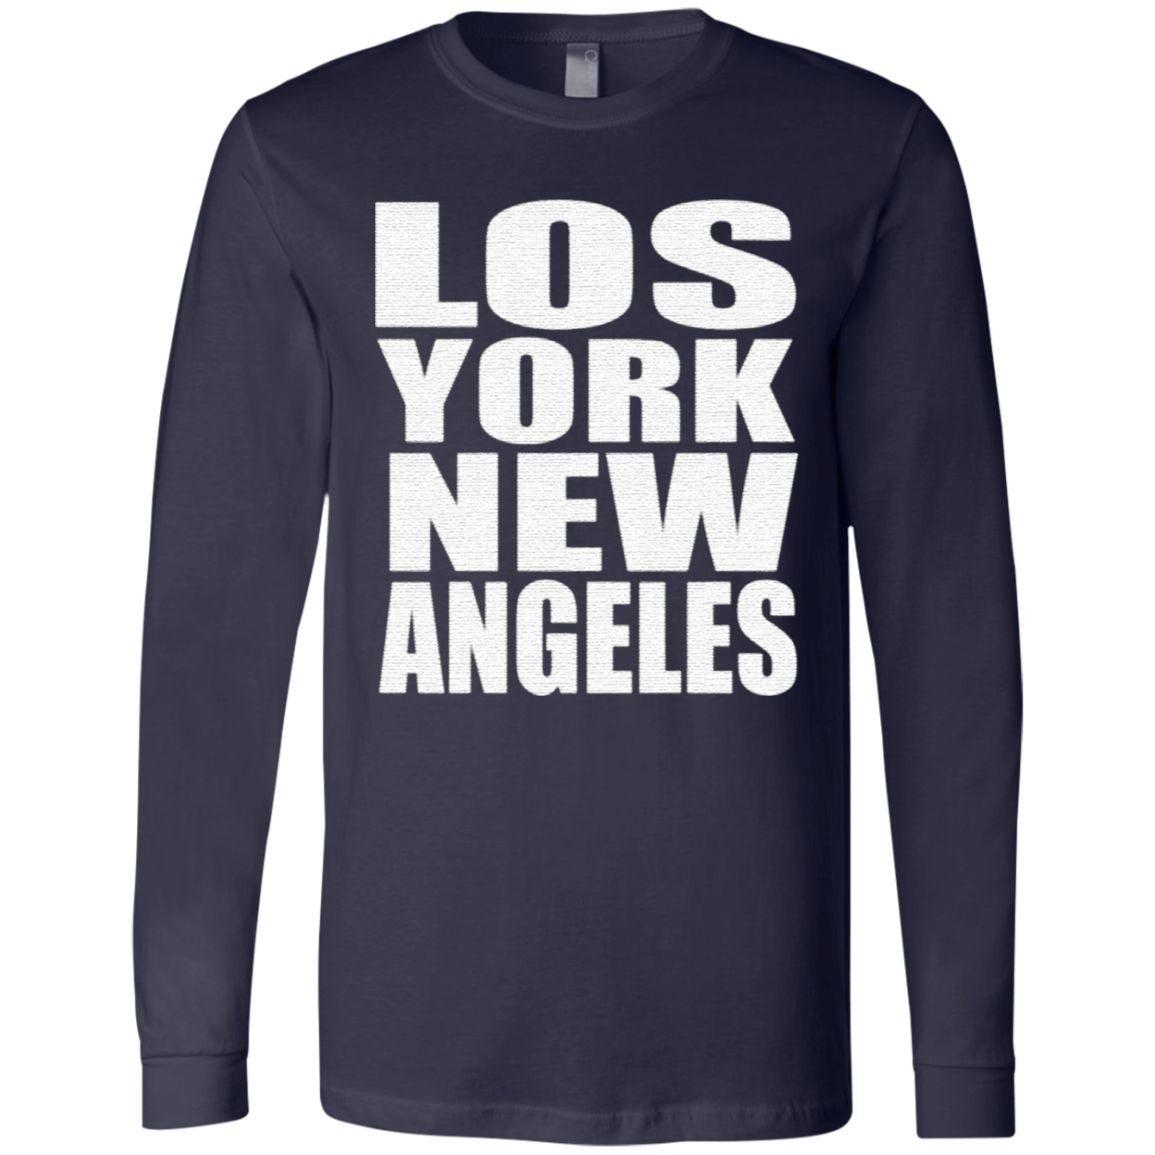 Los York Shirt Los York New Angeles T-Shirt